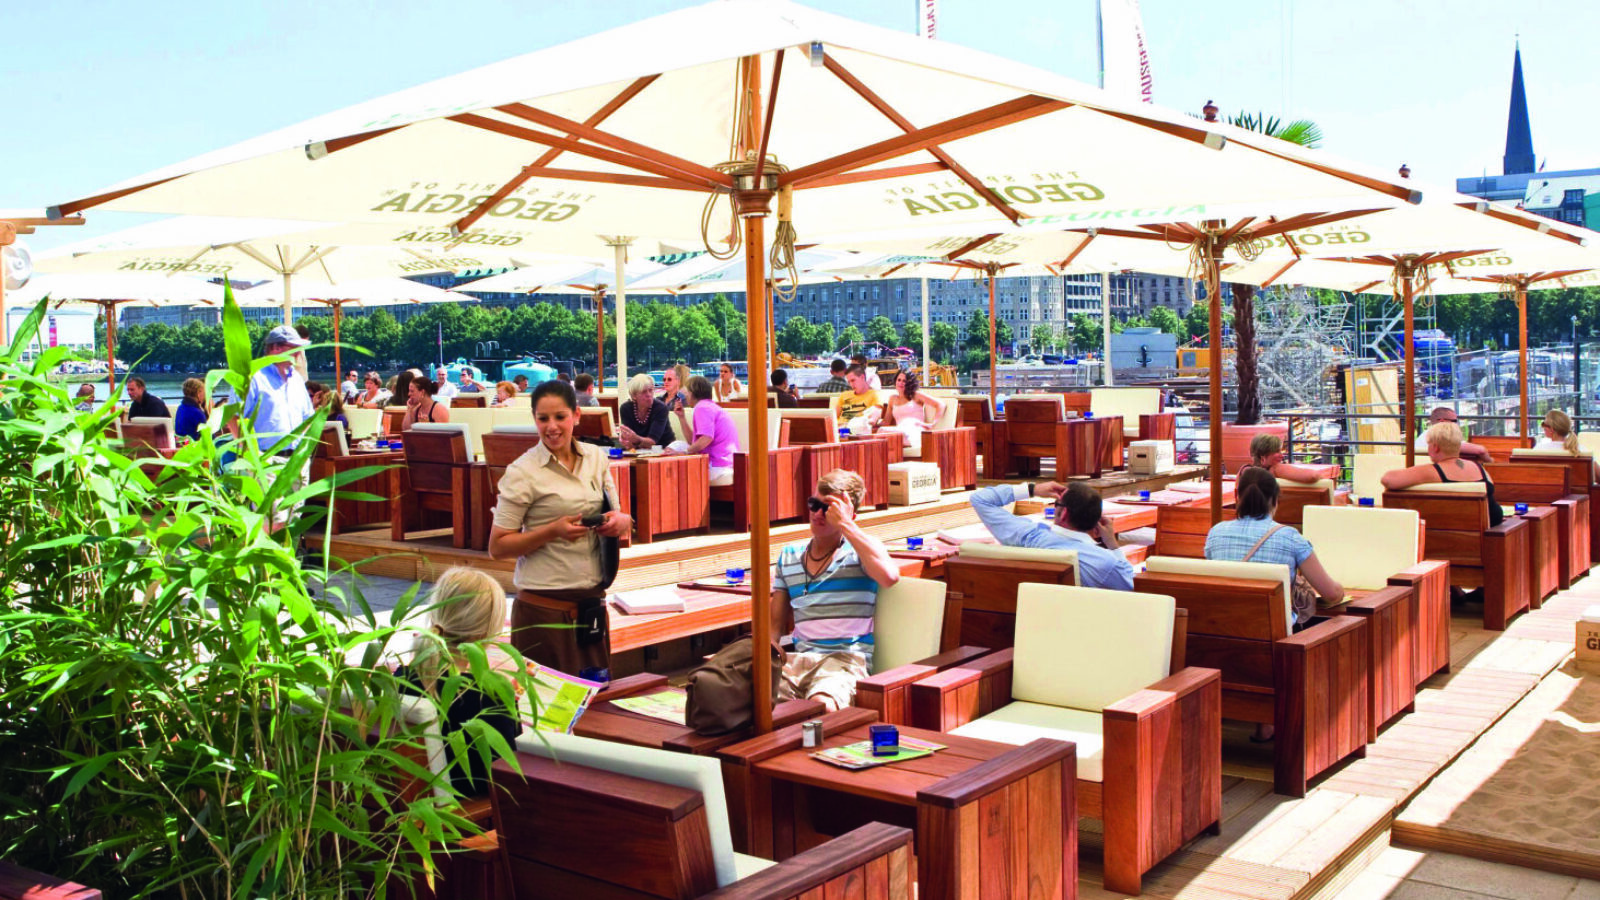 OXMOX Außengastro-Tipp: Restaurant ALEX Alsterpavillon